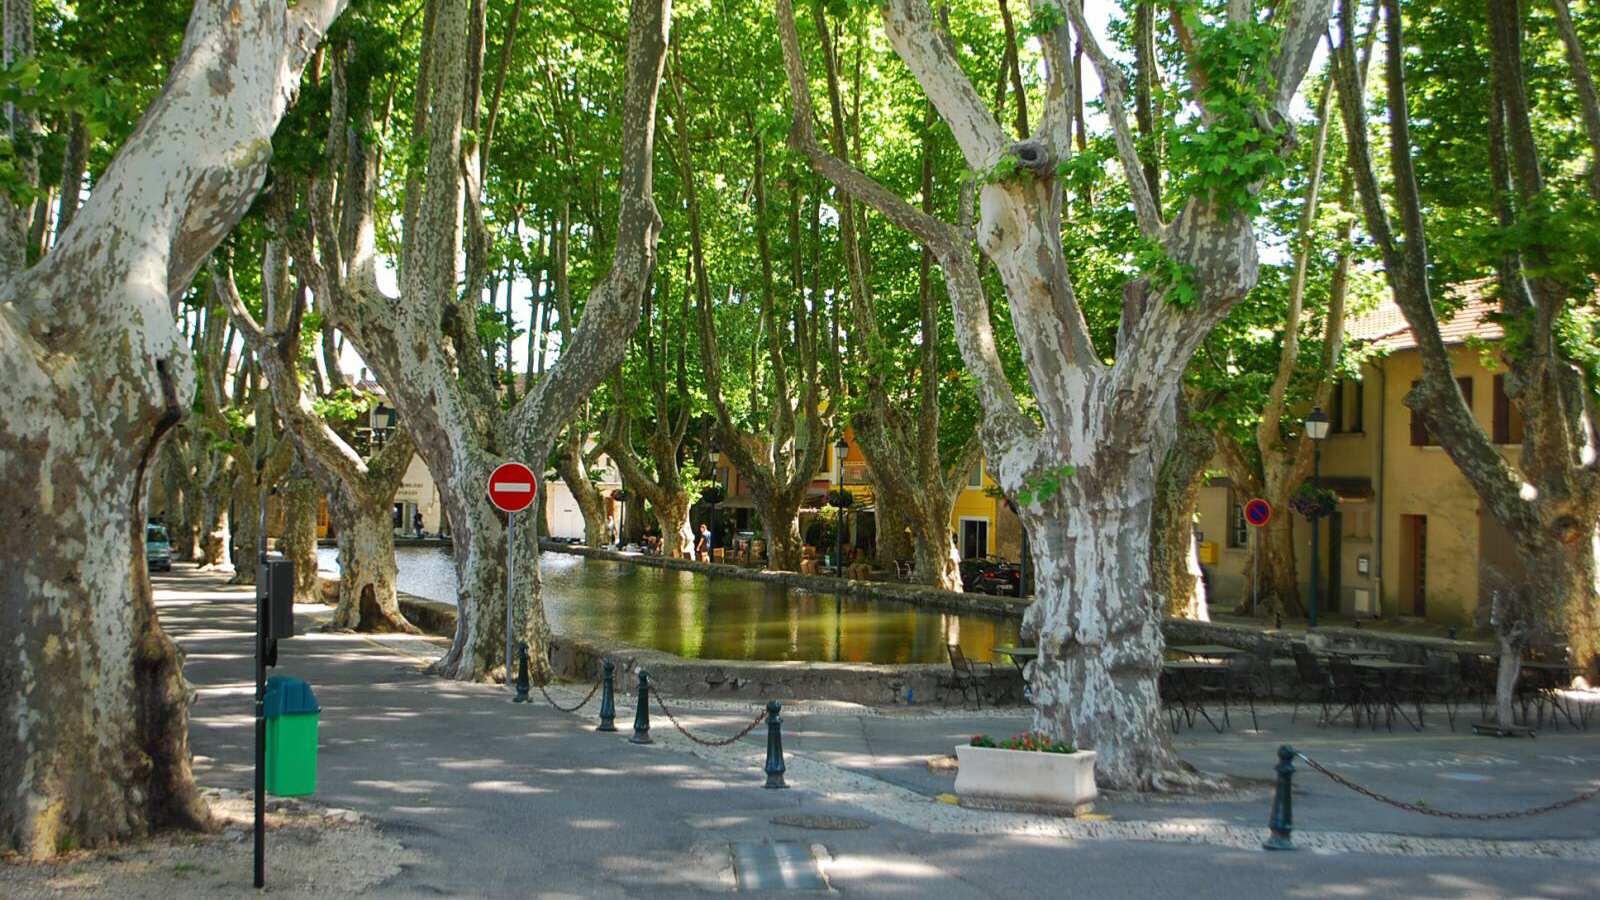 Bazén ve městě Cucuron